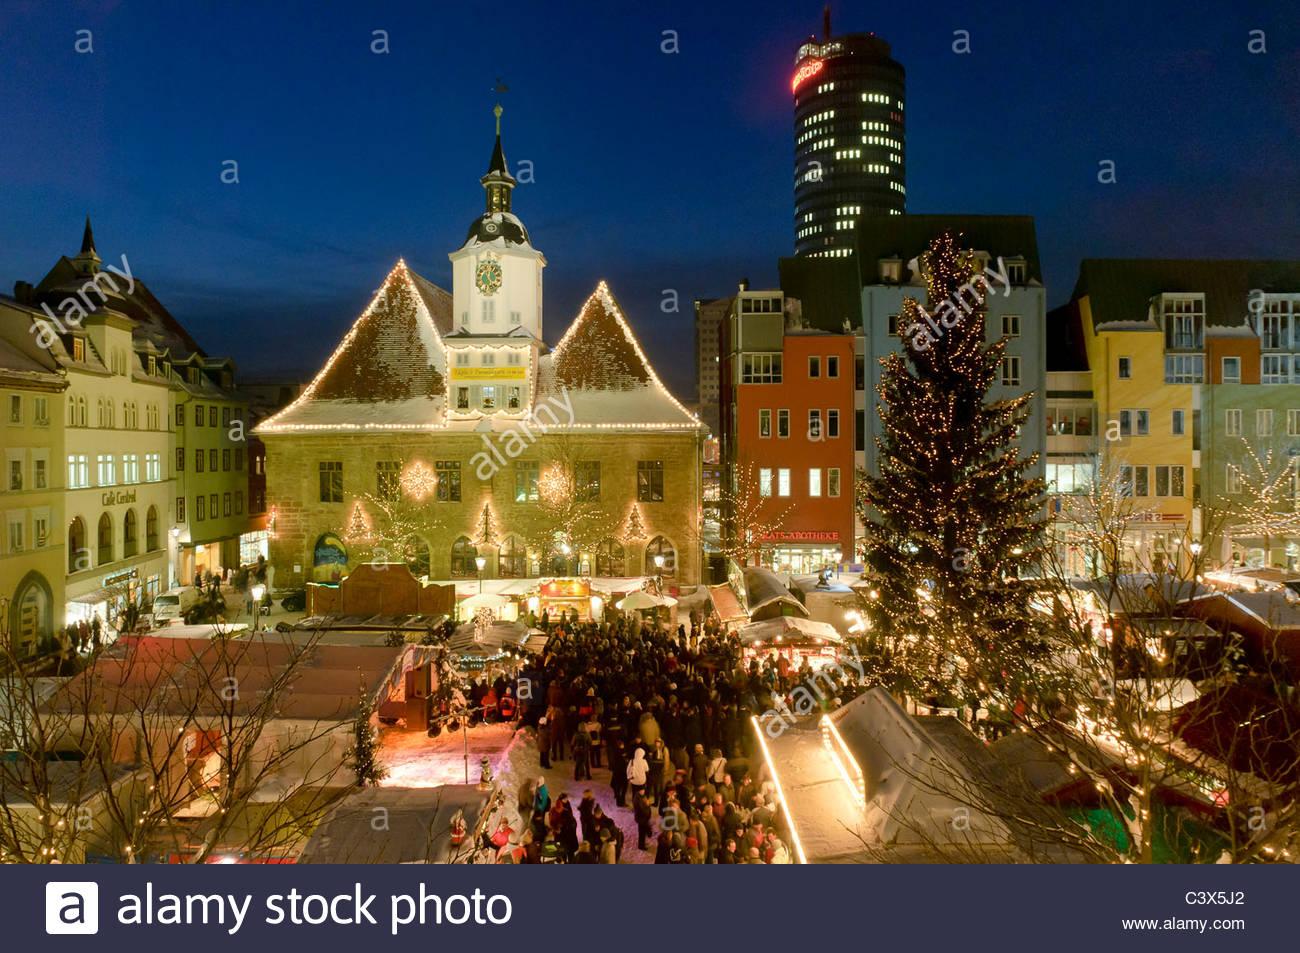 Weihnachtsmarkt W.Jenaer Weihnachtsmarkt Christmas Market Jena Thuringia Germany